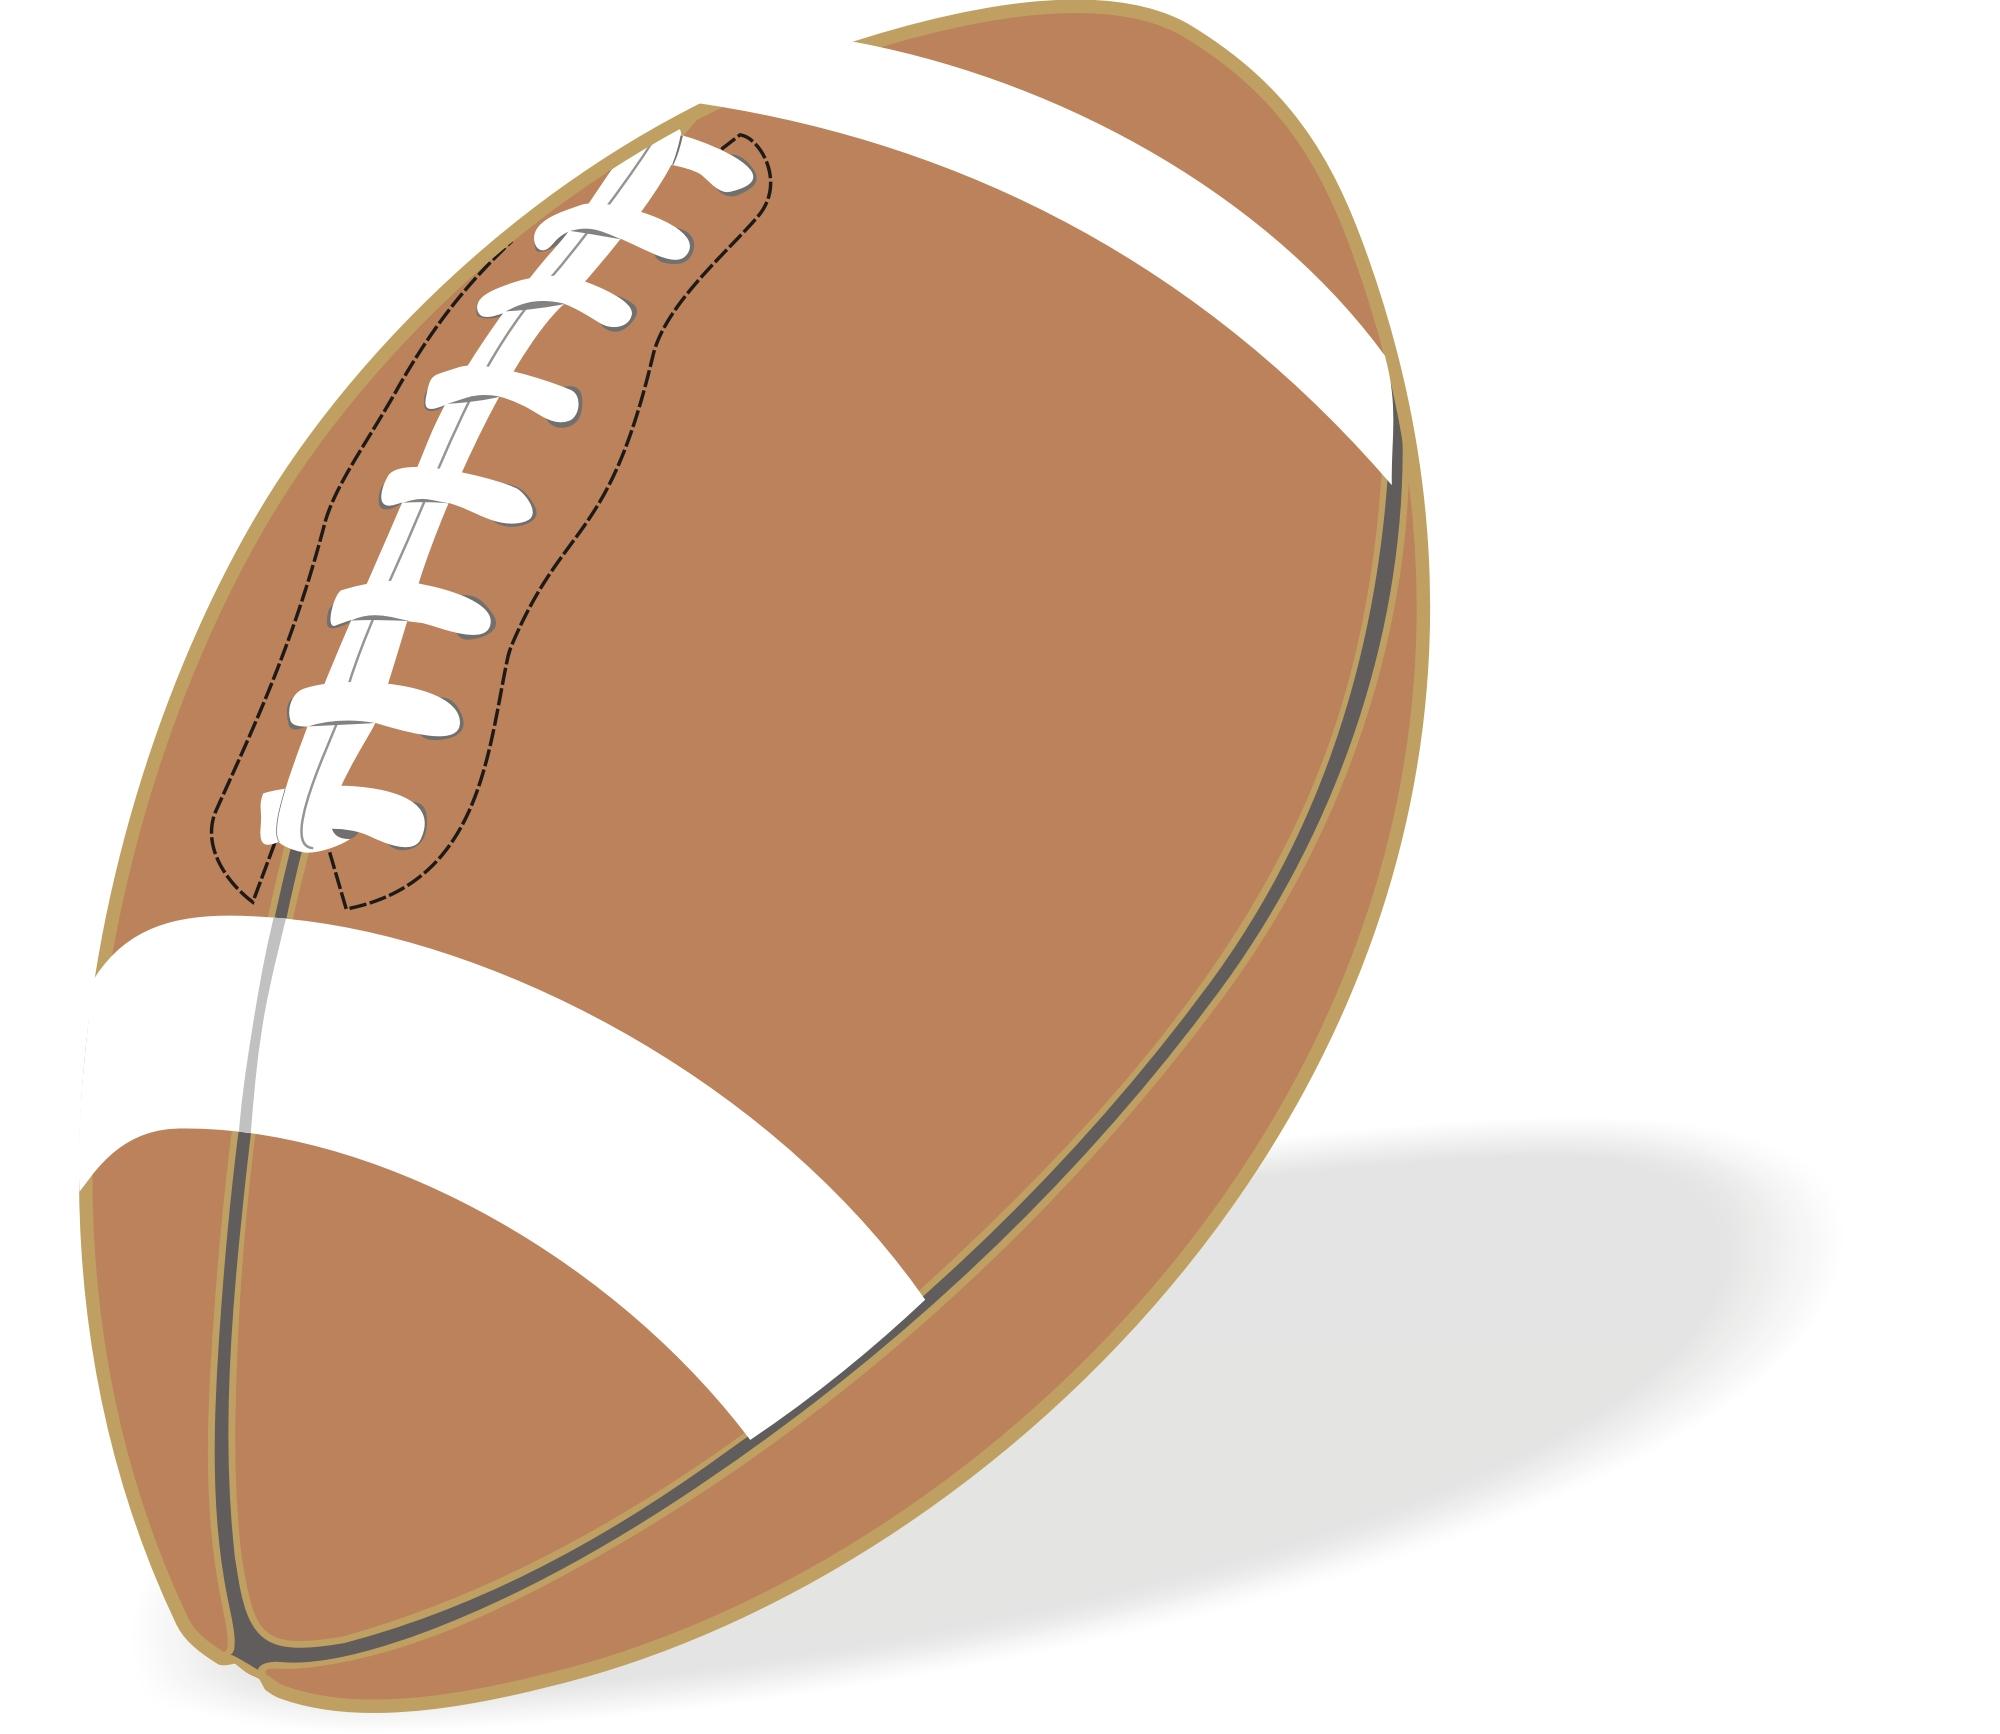 Free Football Clip Art